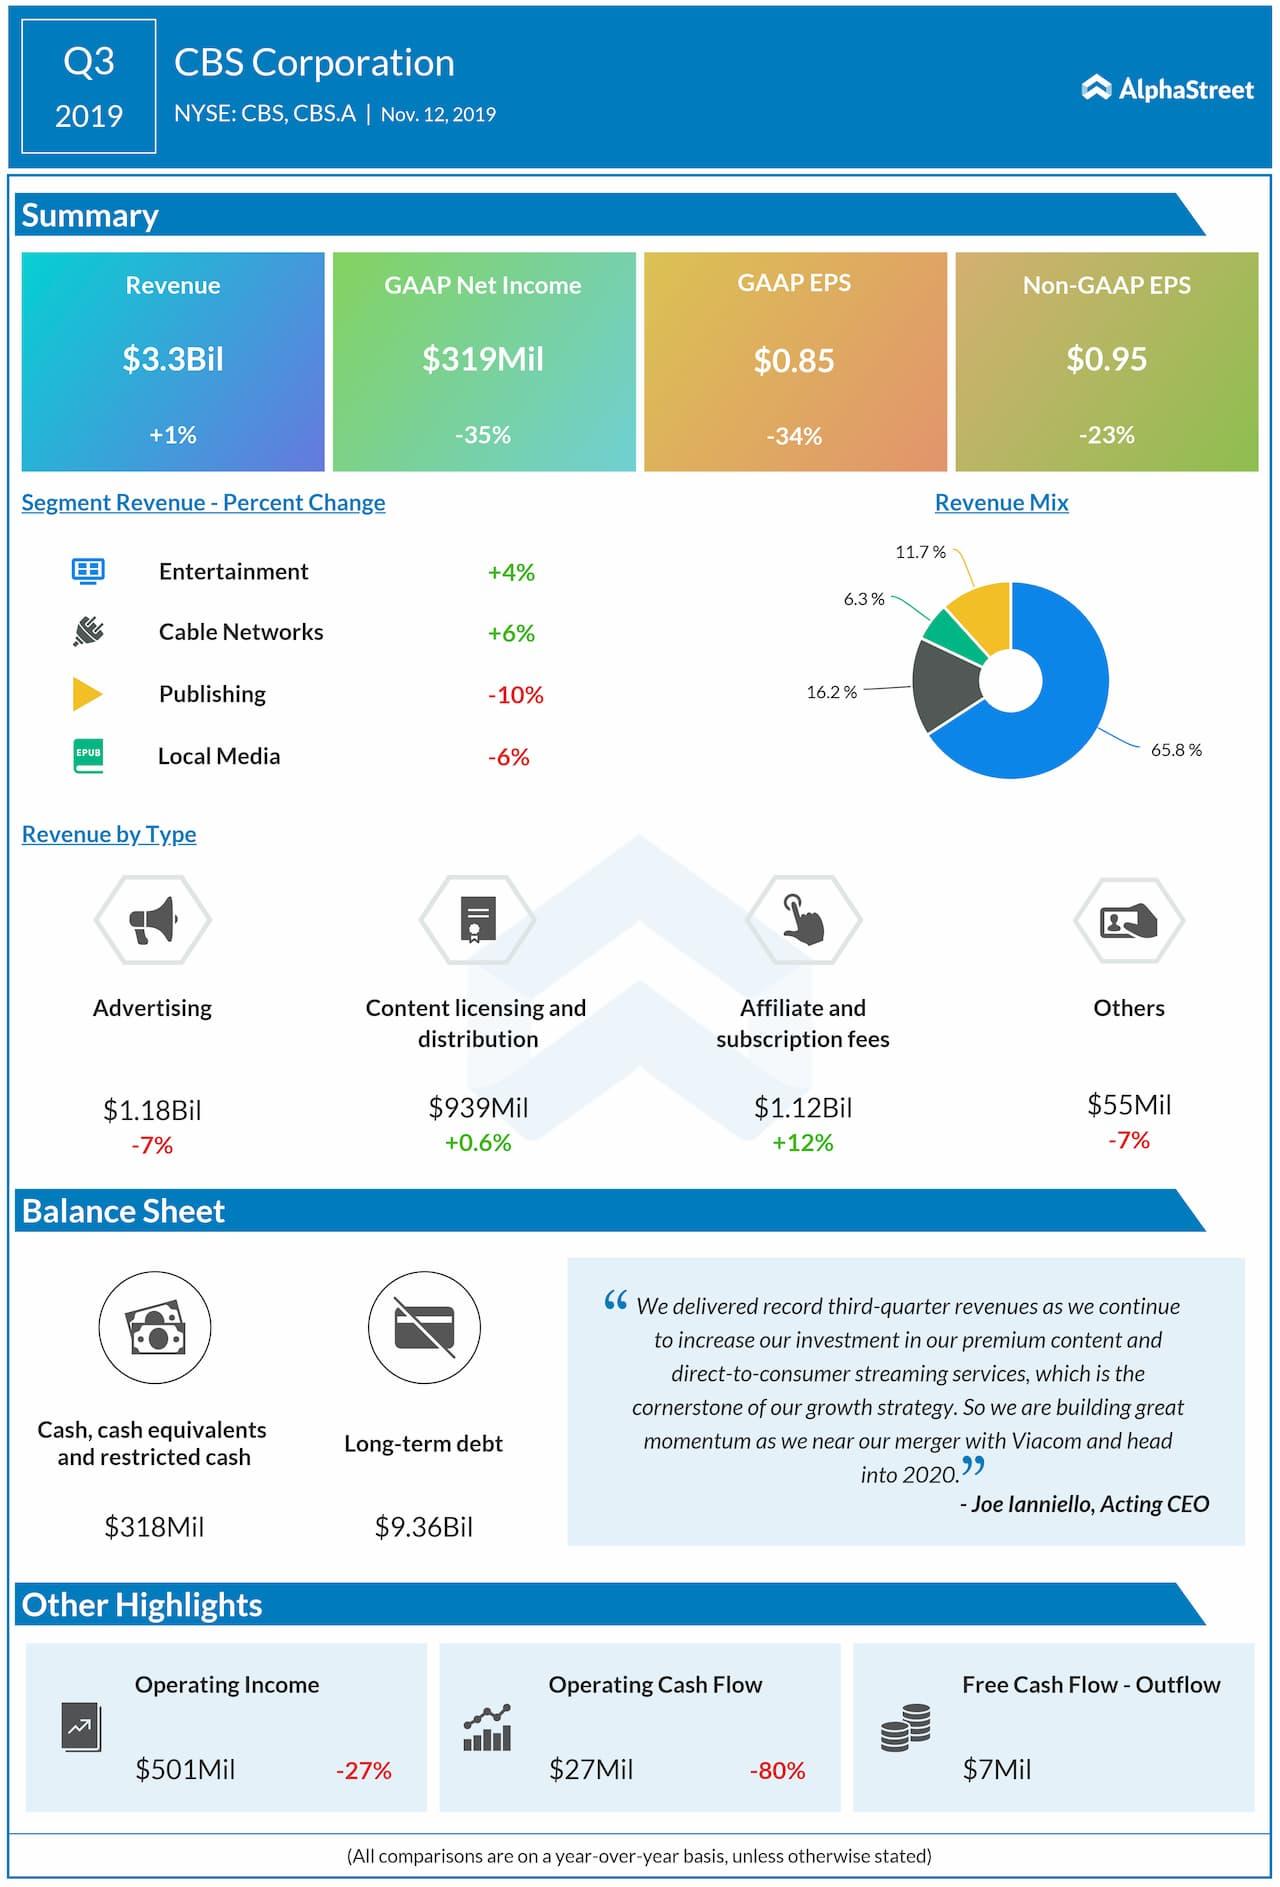 CBS Corporation Q3 2019 Earnings Snapshot